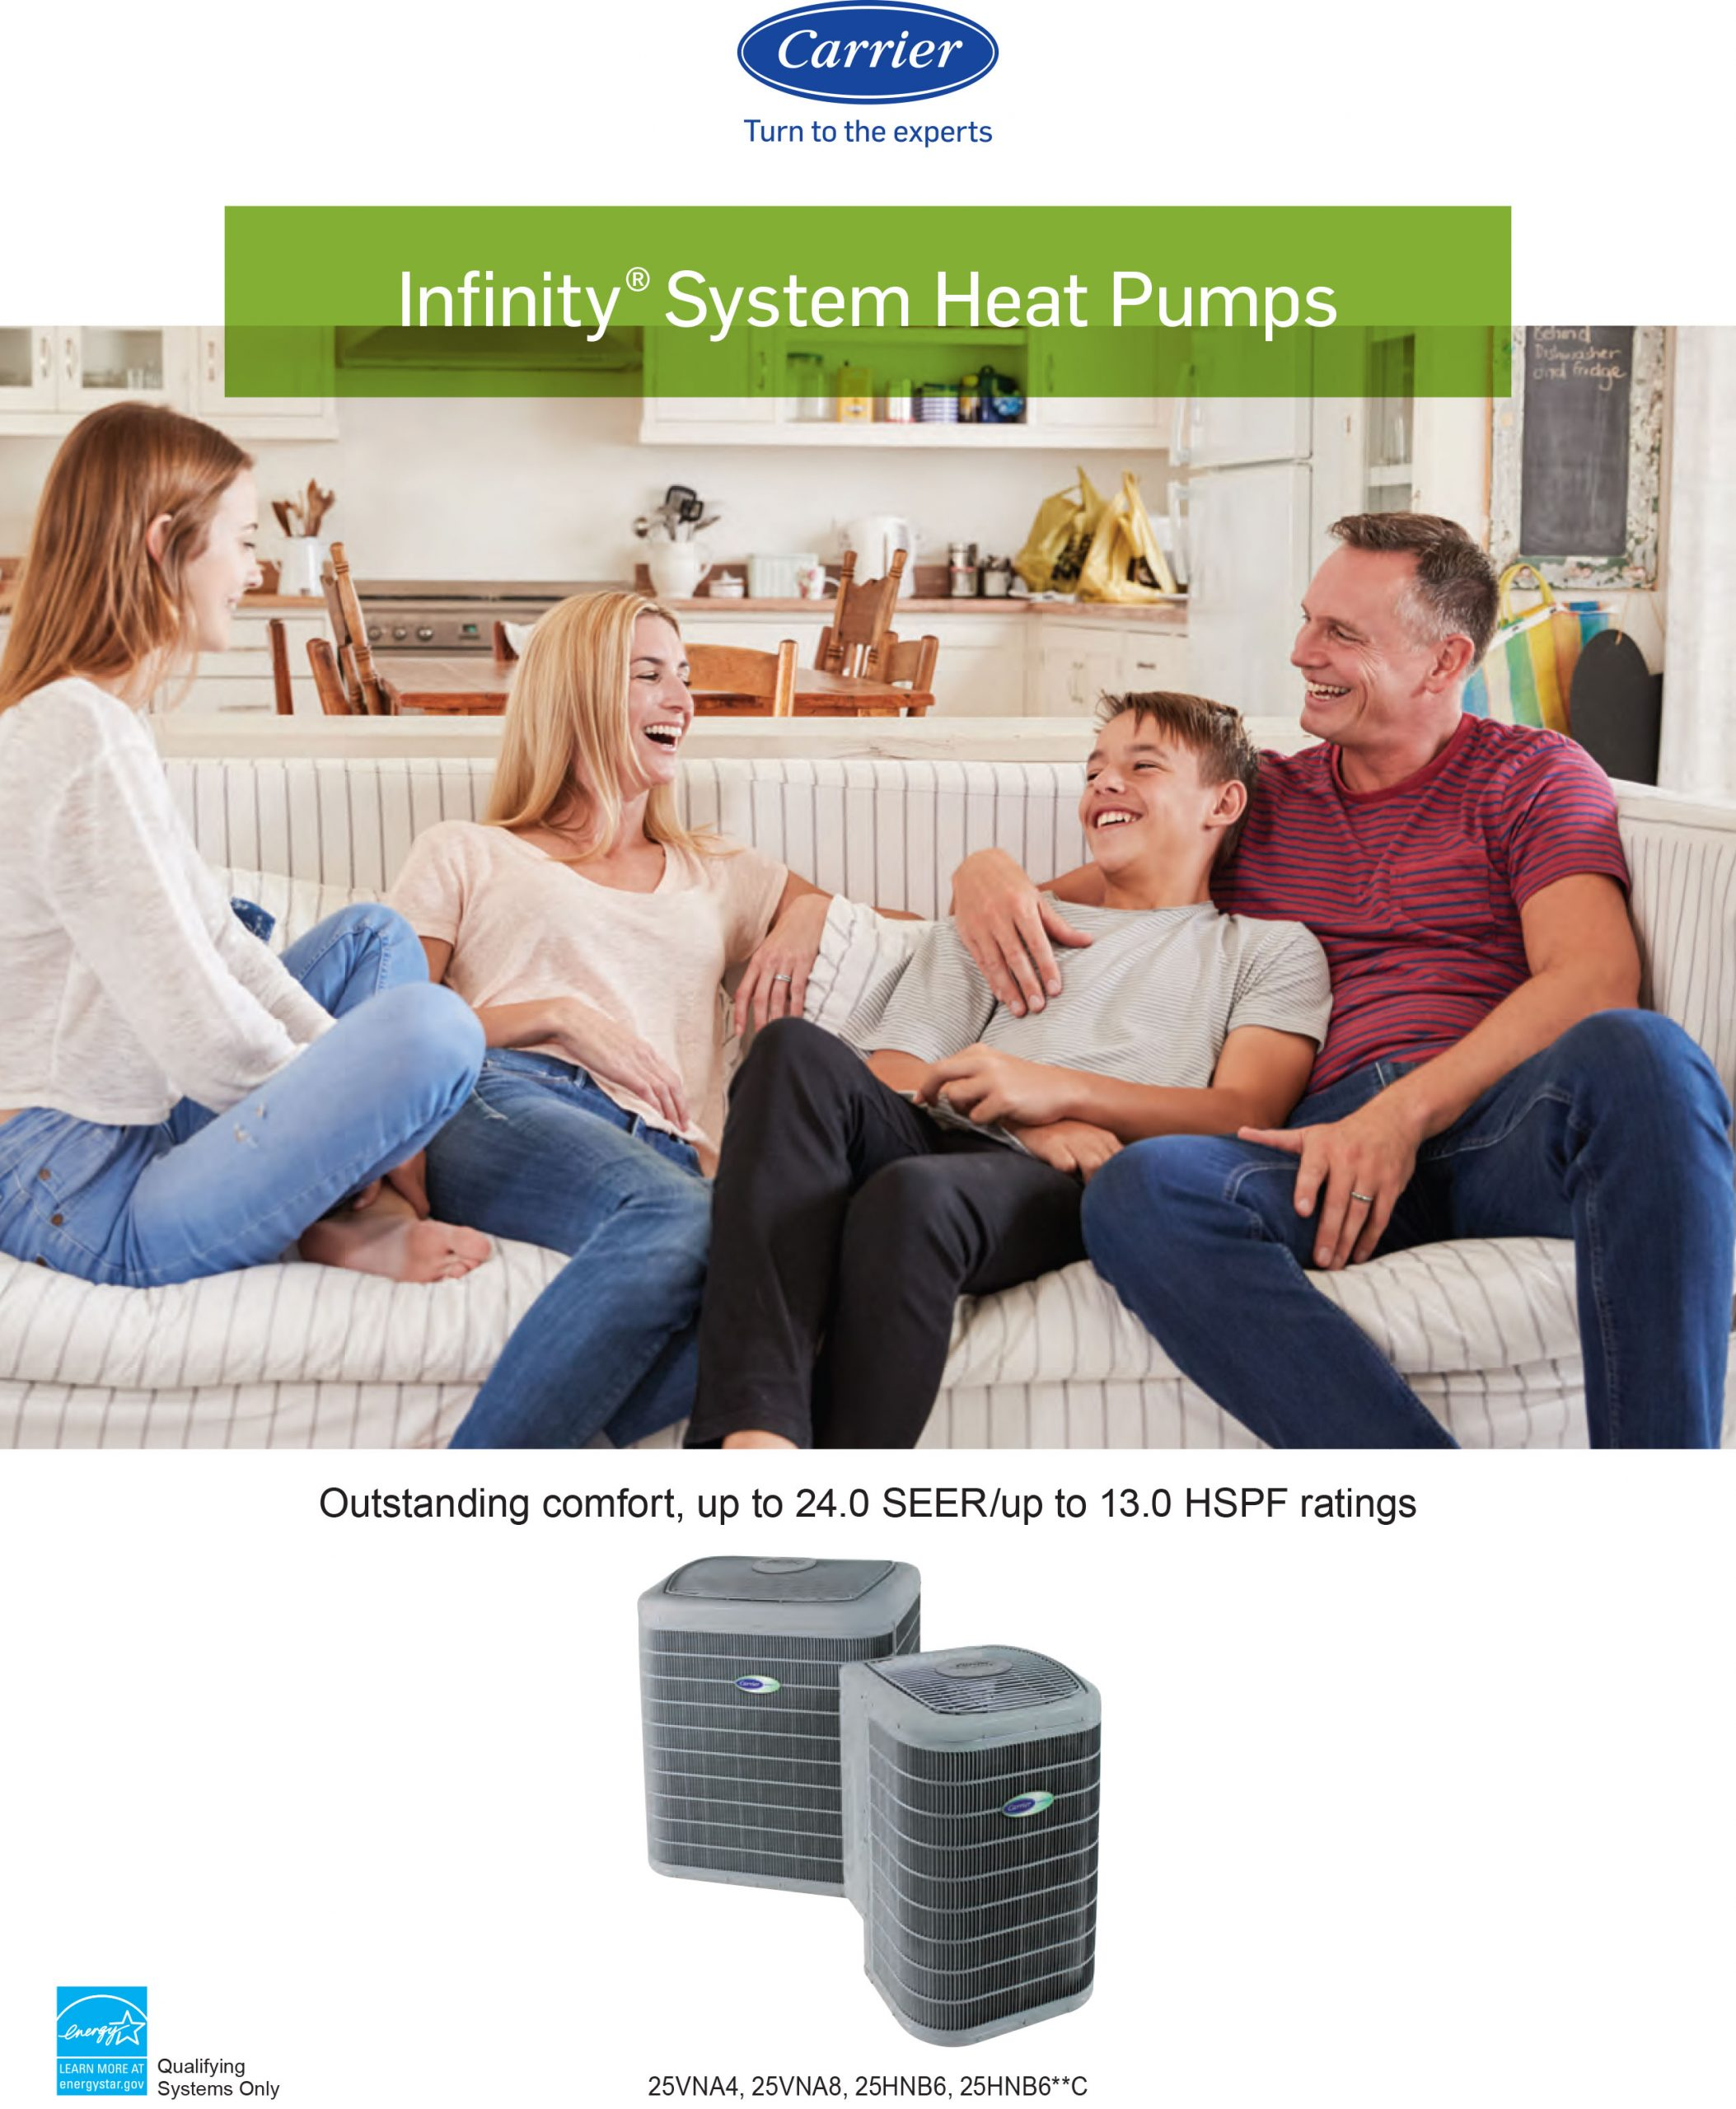 Carrier Infinity Heat Pumps